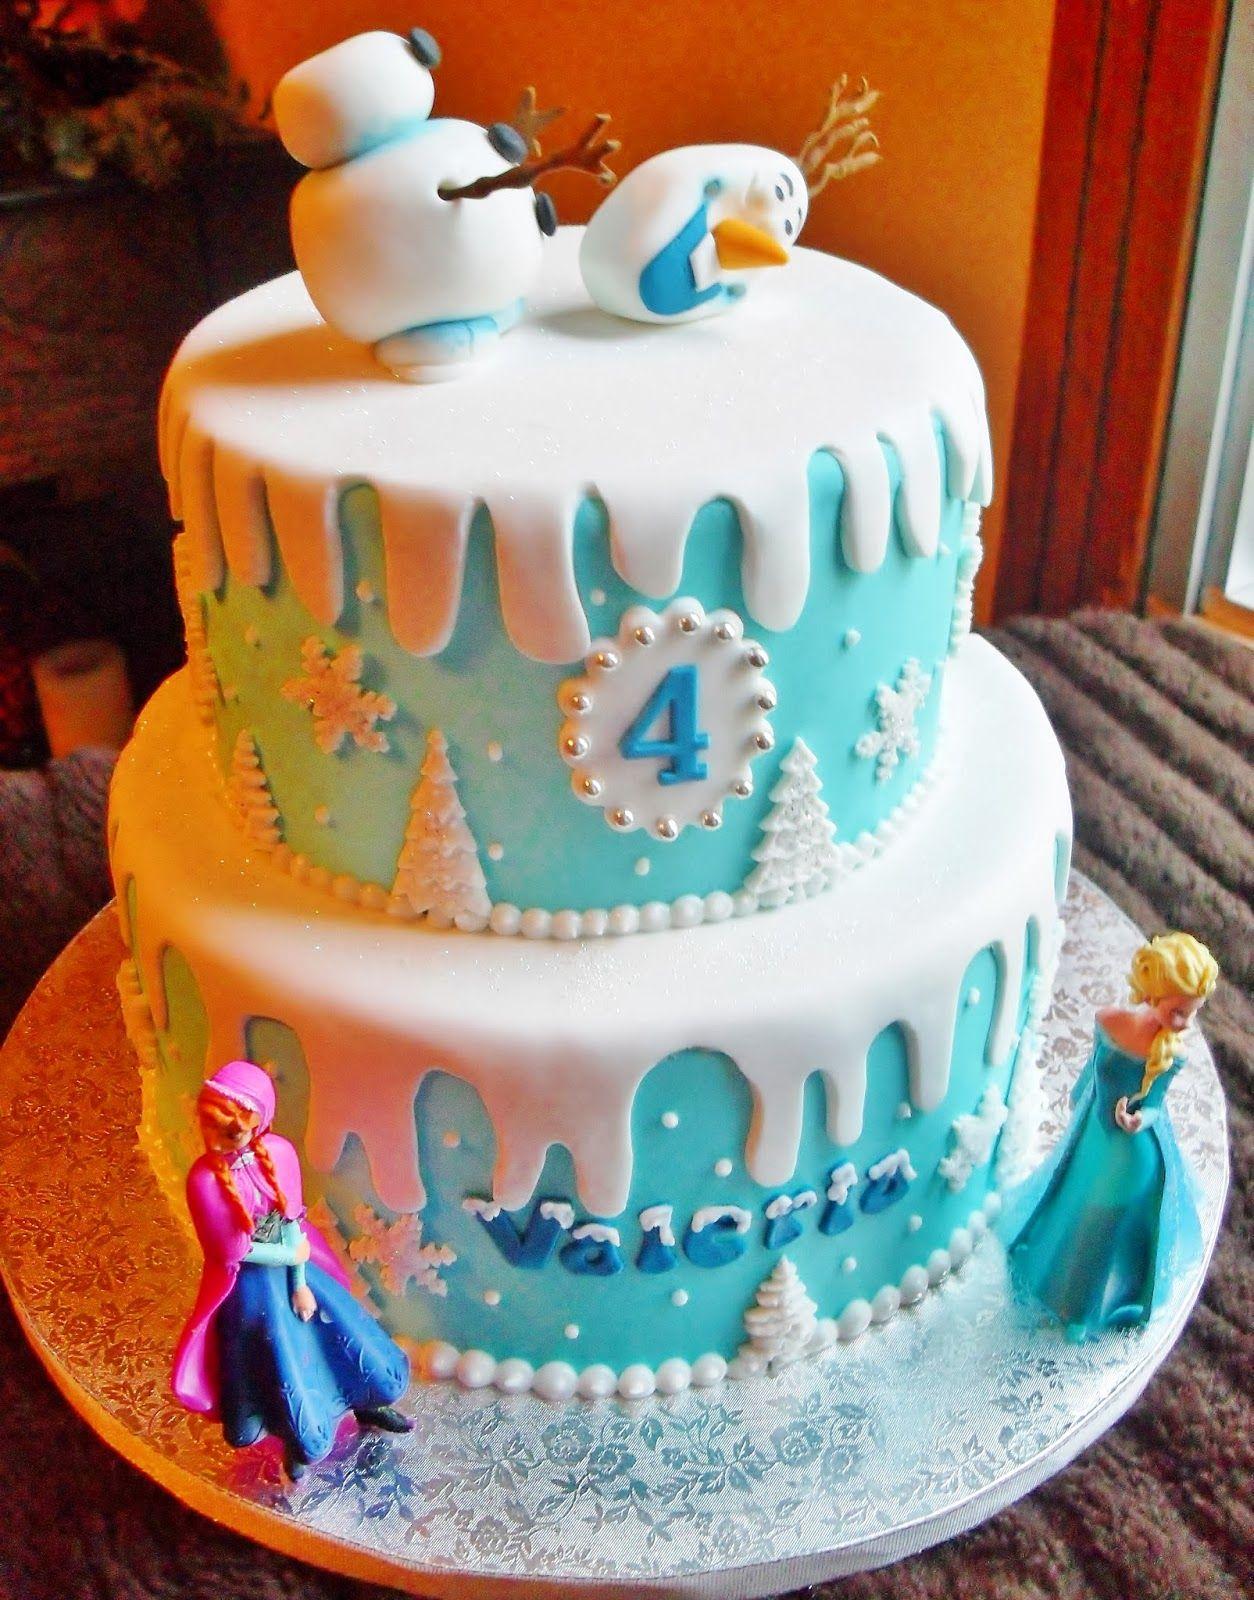 Disneys Frozen Birthday Party Ideas Cake Birthdays and Birthday